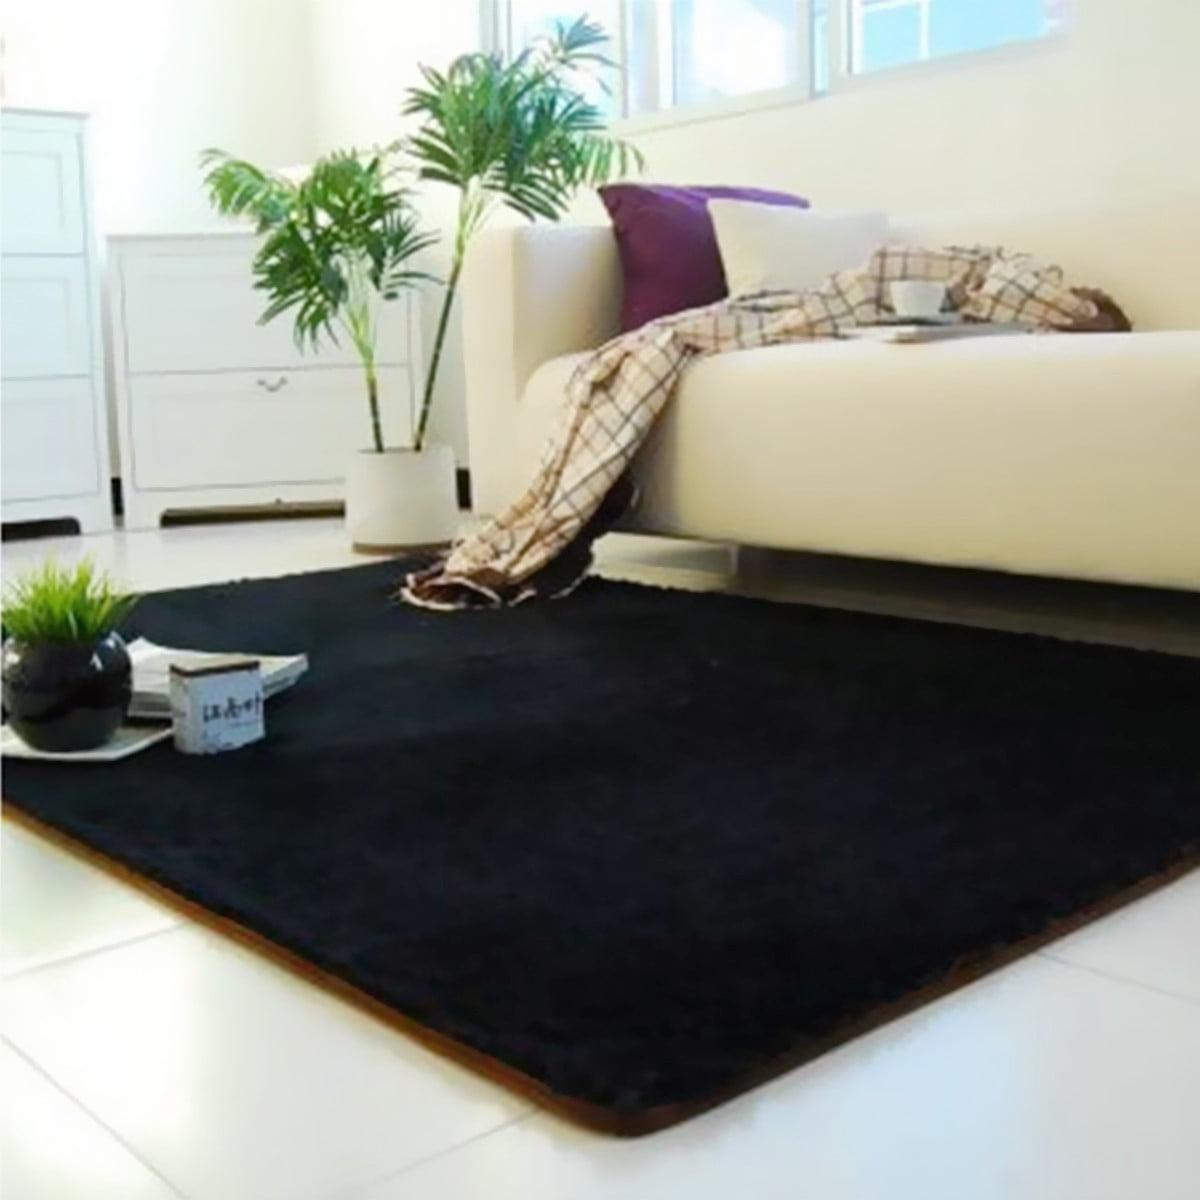 Modern Soft Fluffy Floor Rug Anti Skid Shag Shaggy Area Bedroom Karpet Premium 160x230 Turkiye Dining Room Carpet Yoga Mat Winter Child Play